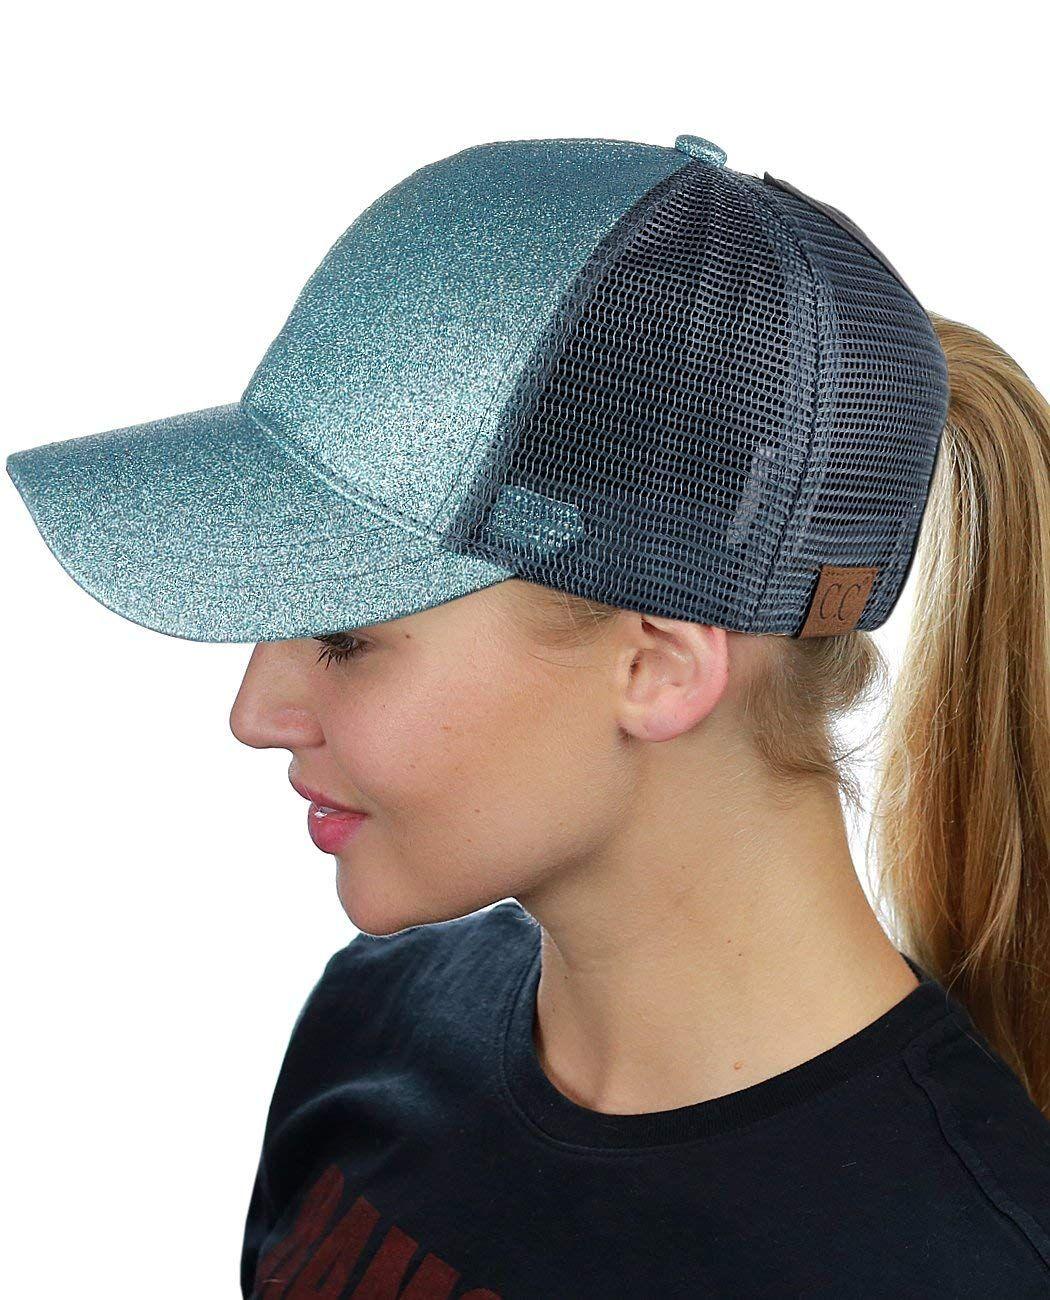 4c0c02a8 C.C Ponycap Messy High Bun Ponytail Adjustable Glitter Mesh Trucker Baseball  Cap, Smoky Topaz at Amazon Women's Clothing store: